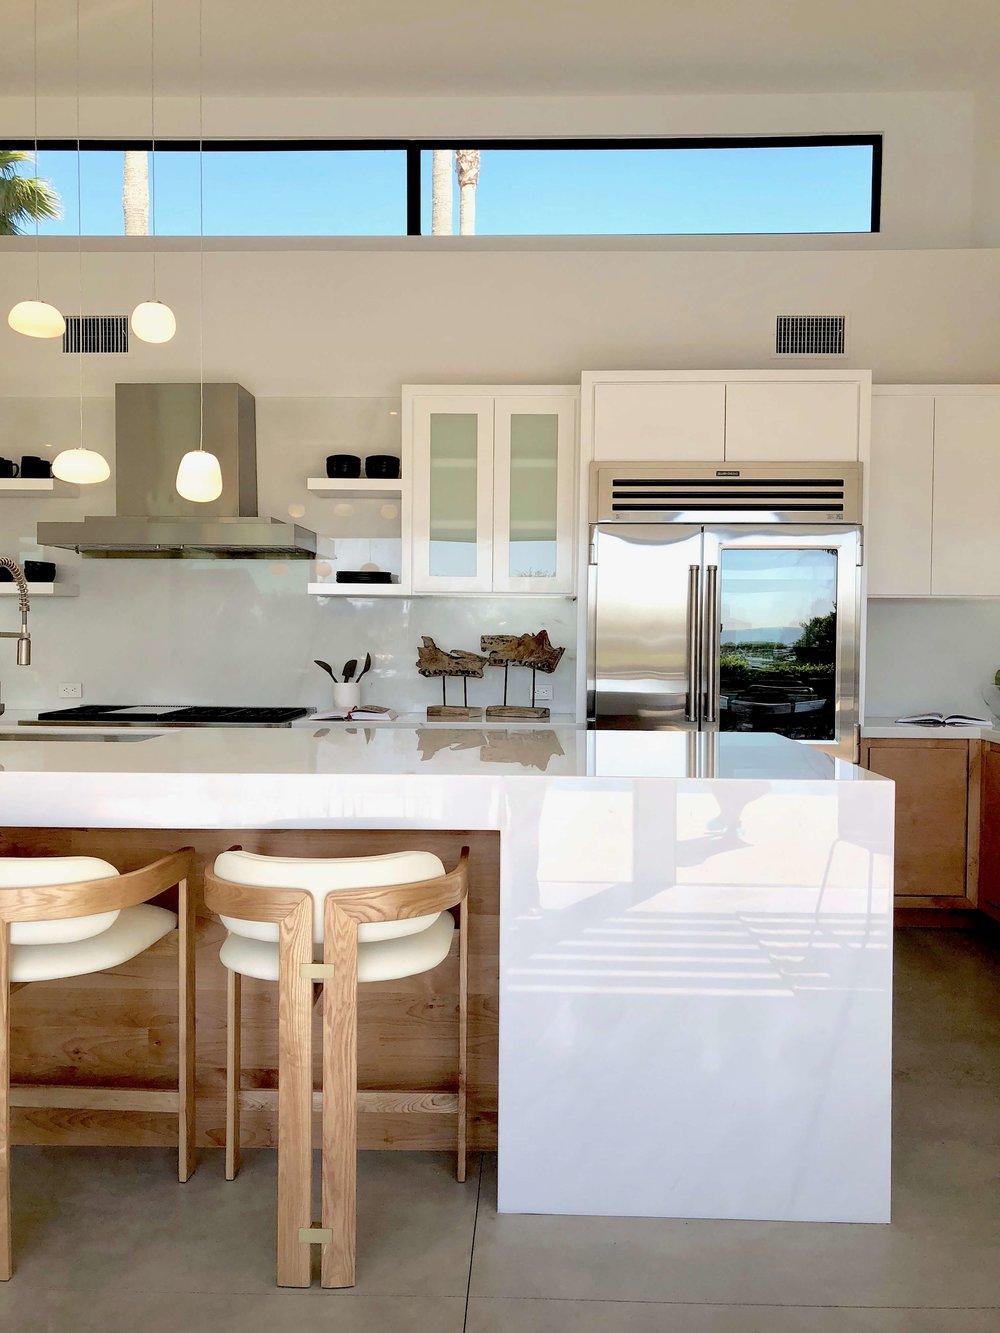 California contemporary kitchen - Dwell on Design's Fall Home Tour, Designer: Vitus Matare #kitchenideas #kitchendesign #kitchenisland